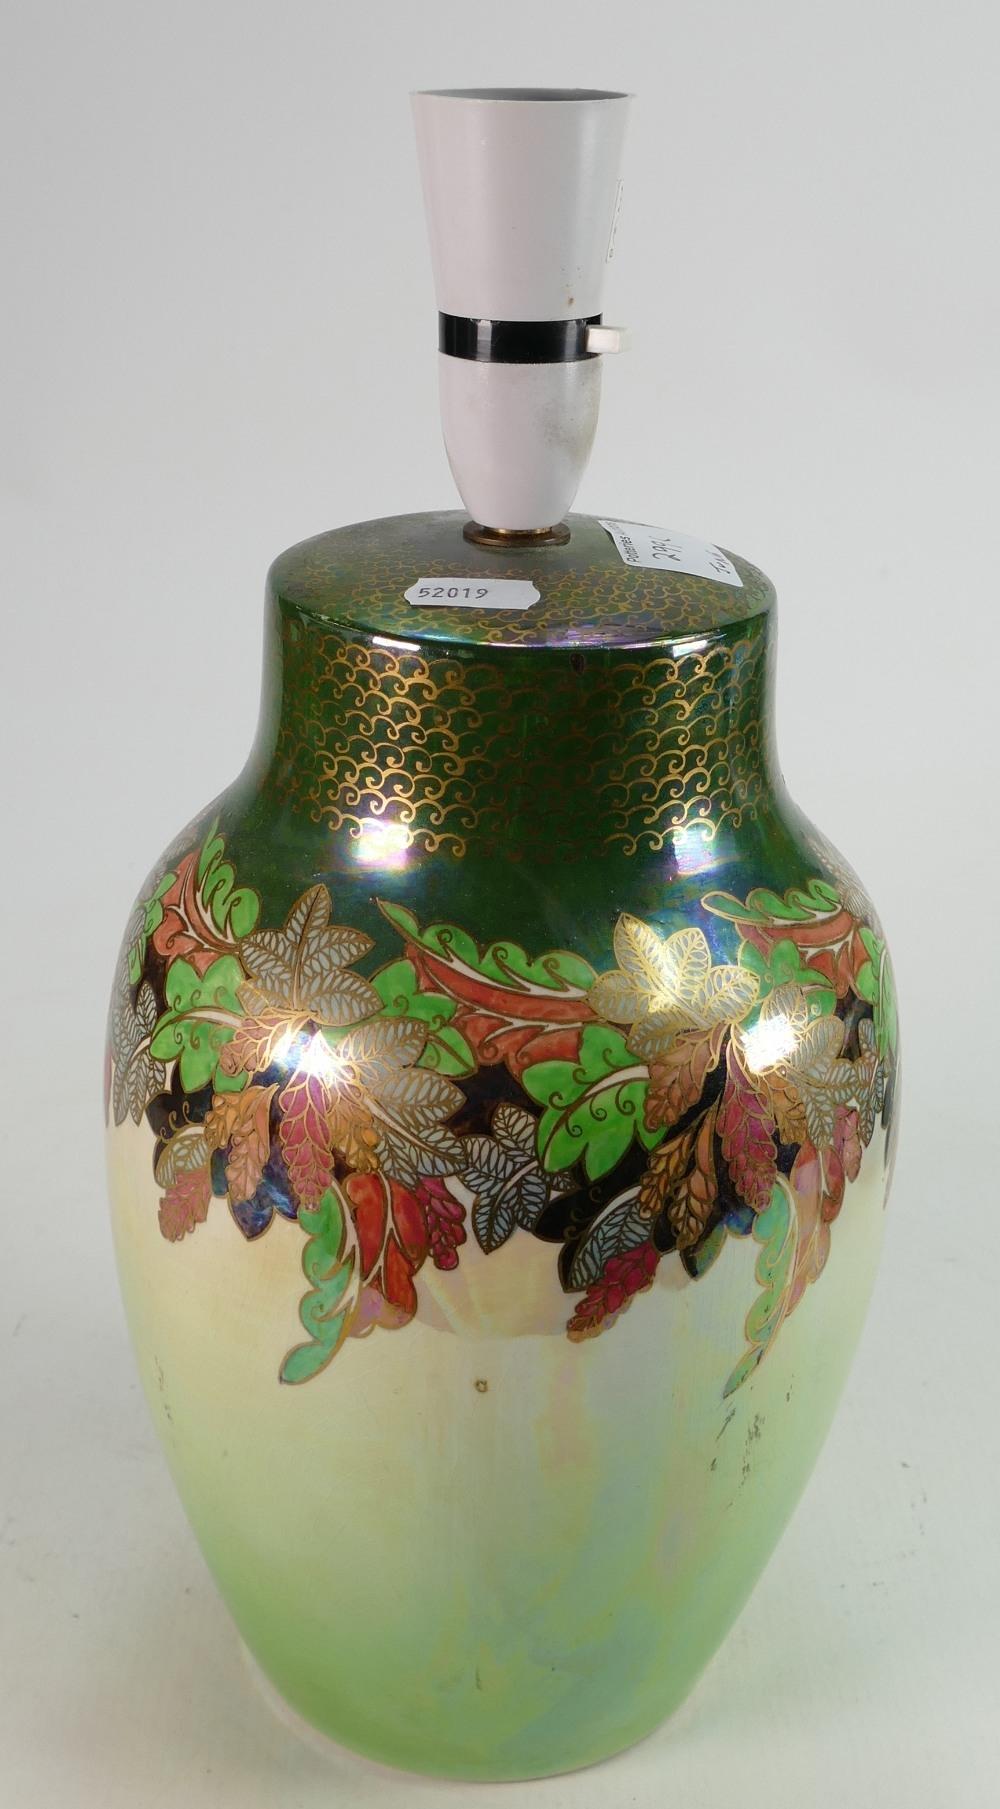 Large Grimwades Royal Winton lustre lamp base: Measures 27 mm excluding fittings.